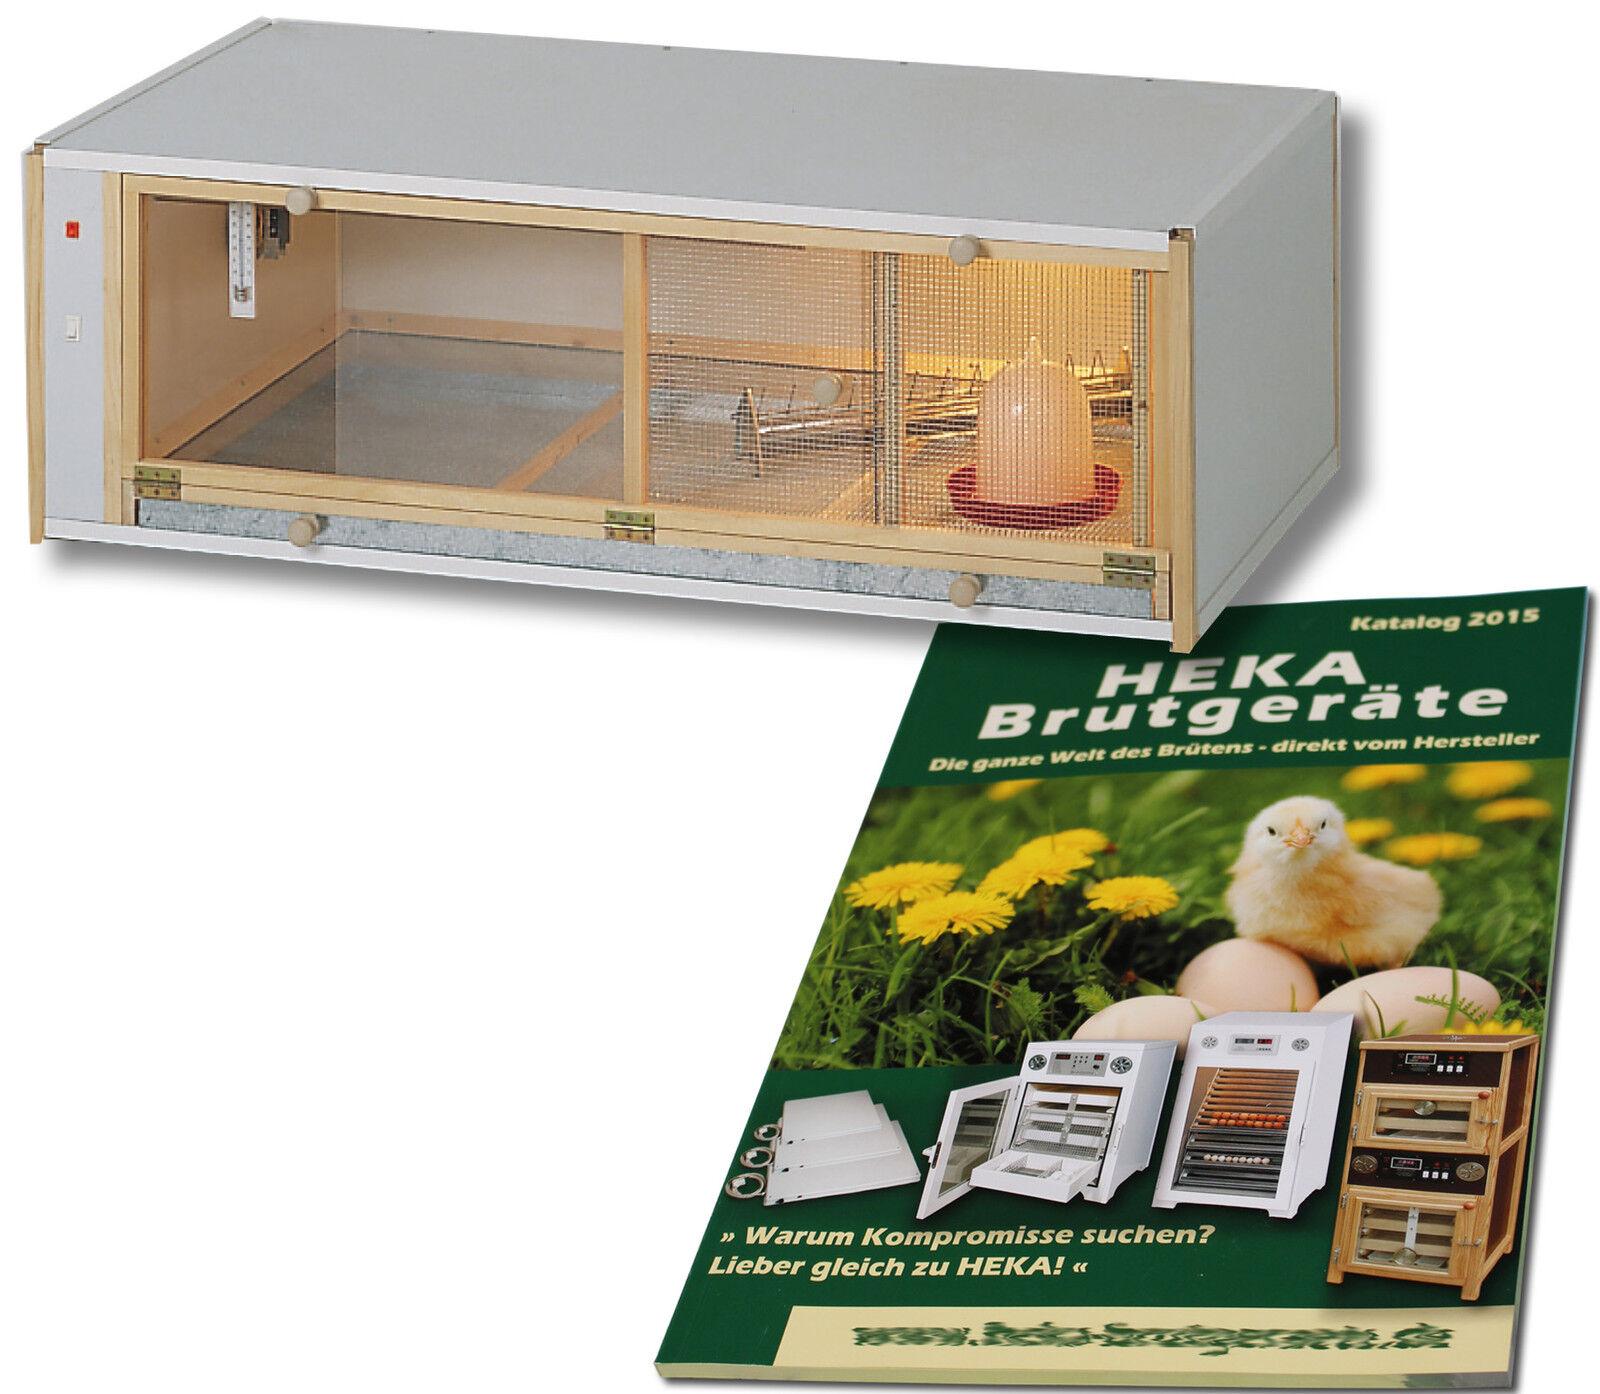 Hekaaufzuchtbox in legno, 120x60x39cm, per  8090 pulcini @ @ @heka  1x art. 4002c